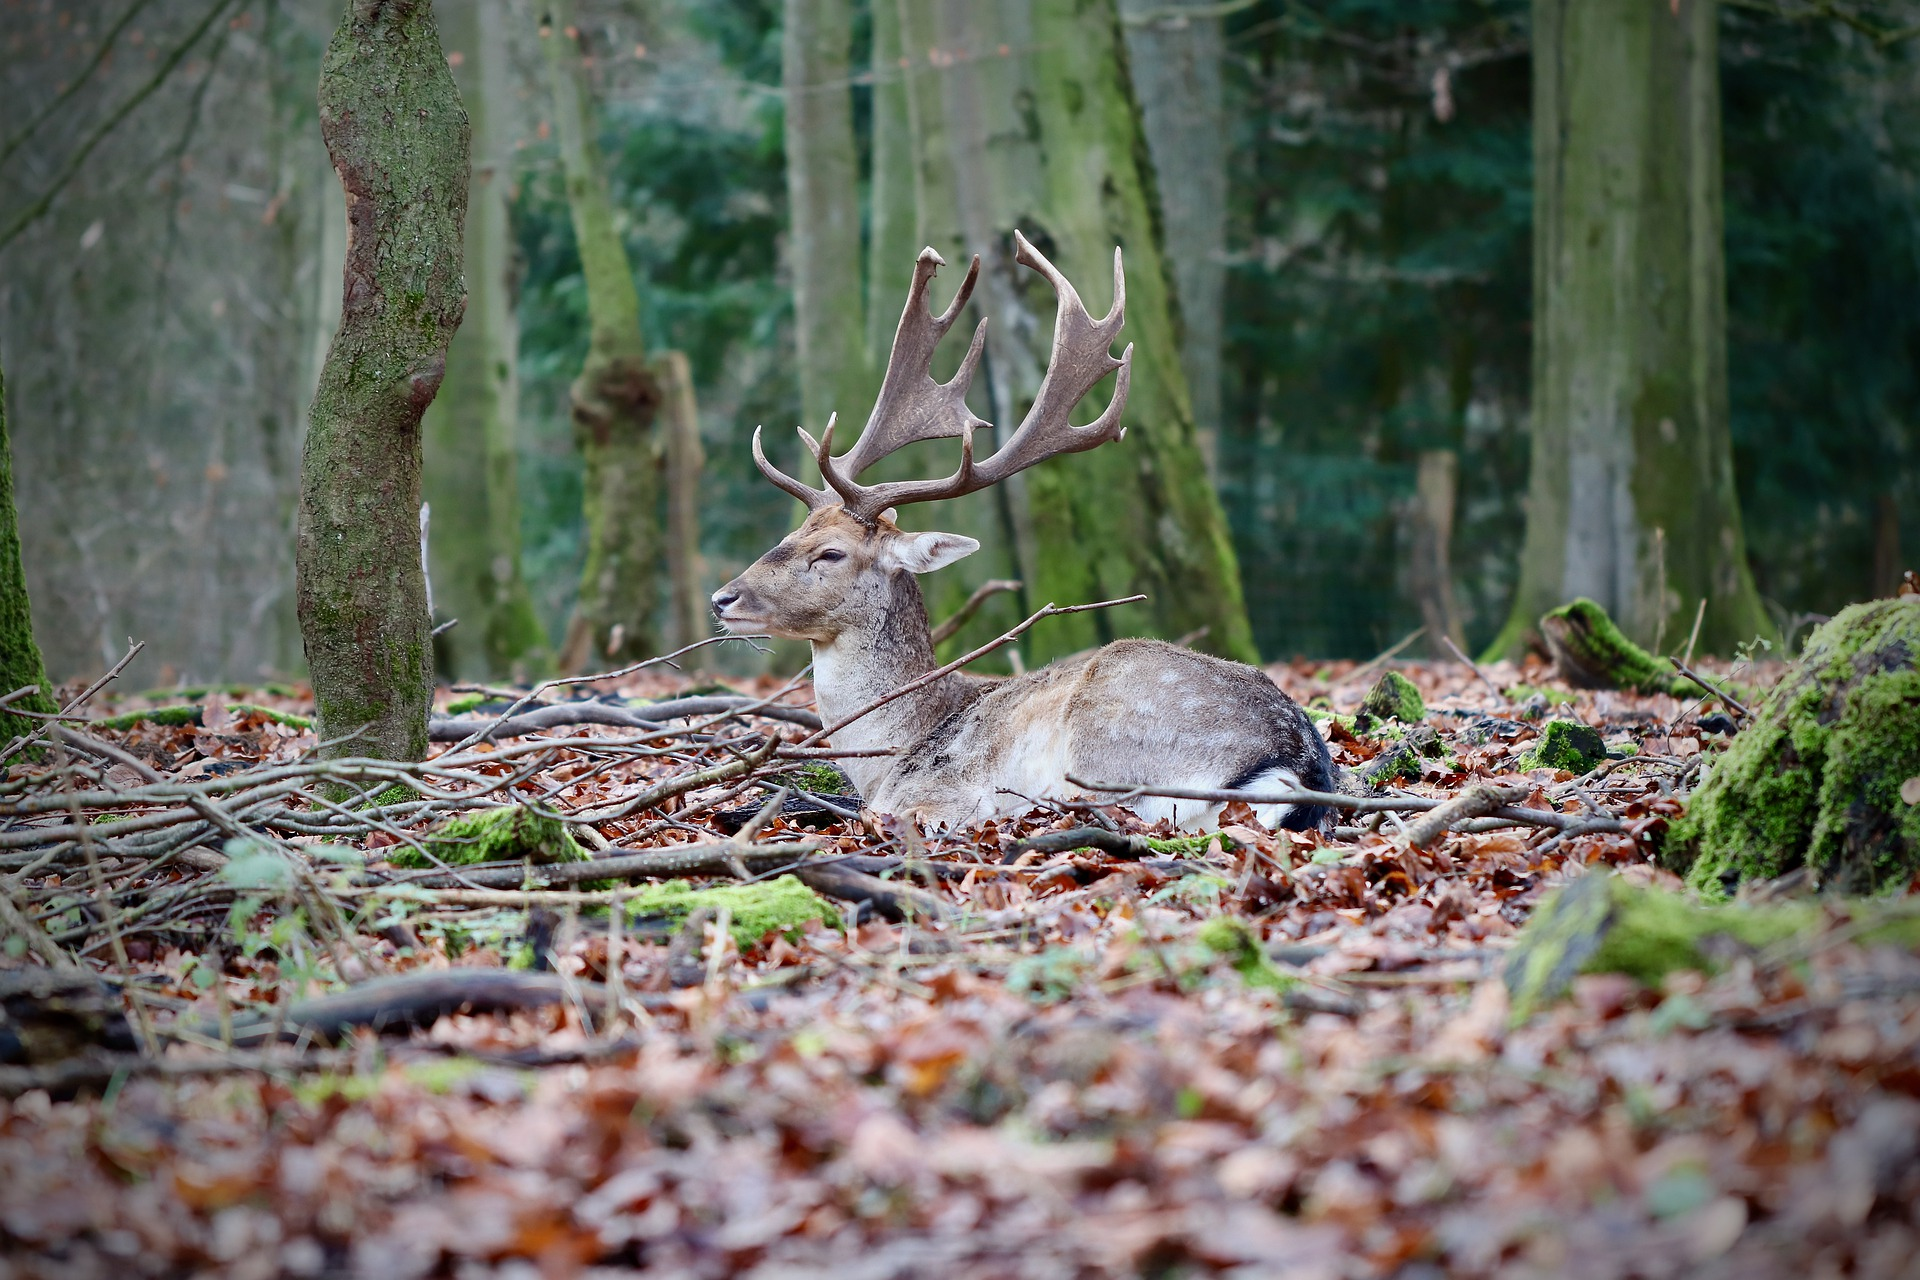 7615-fallow-deer-4735584-1920.jpg